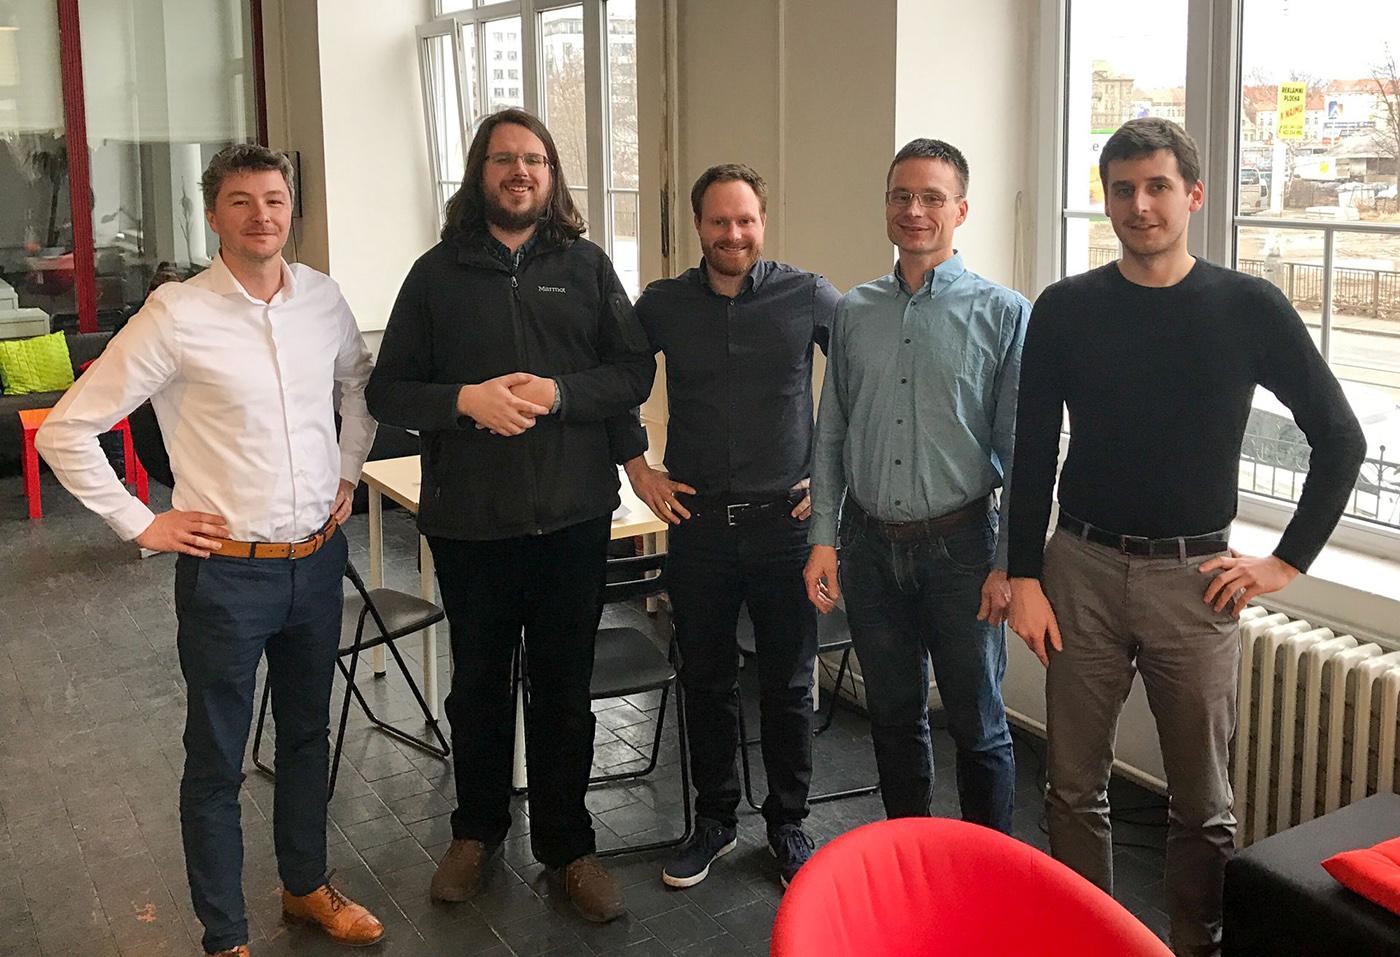 Spoluzakladatel Mitonu Ondřej Raška vlevo s týmem Rossum. Druhý zprava Nikola Rafaj ze StartupYardu